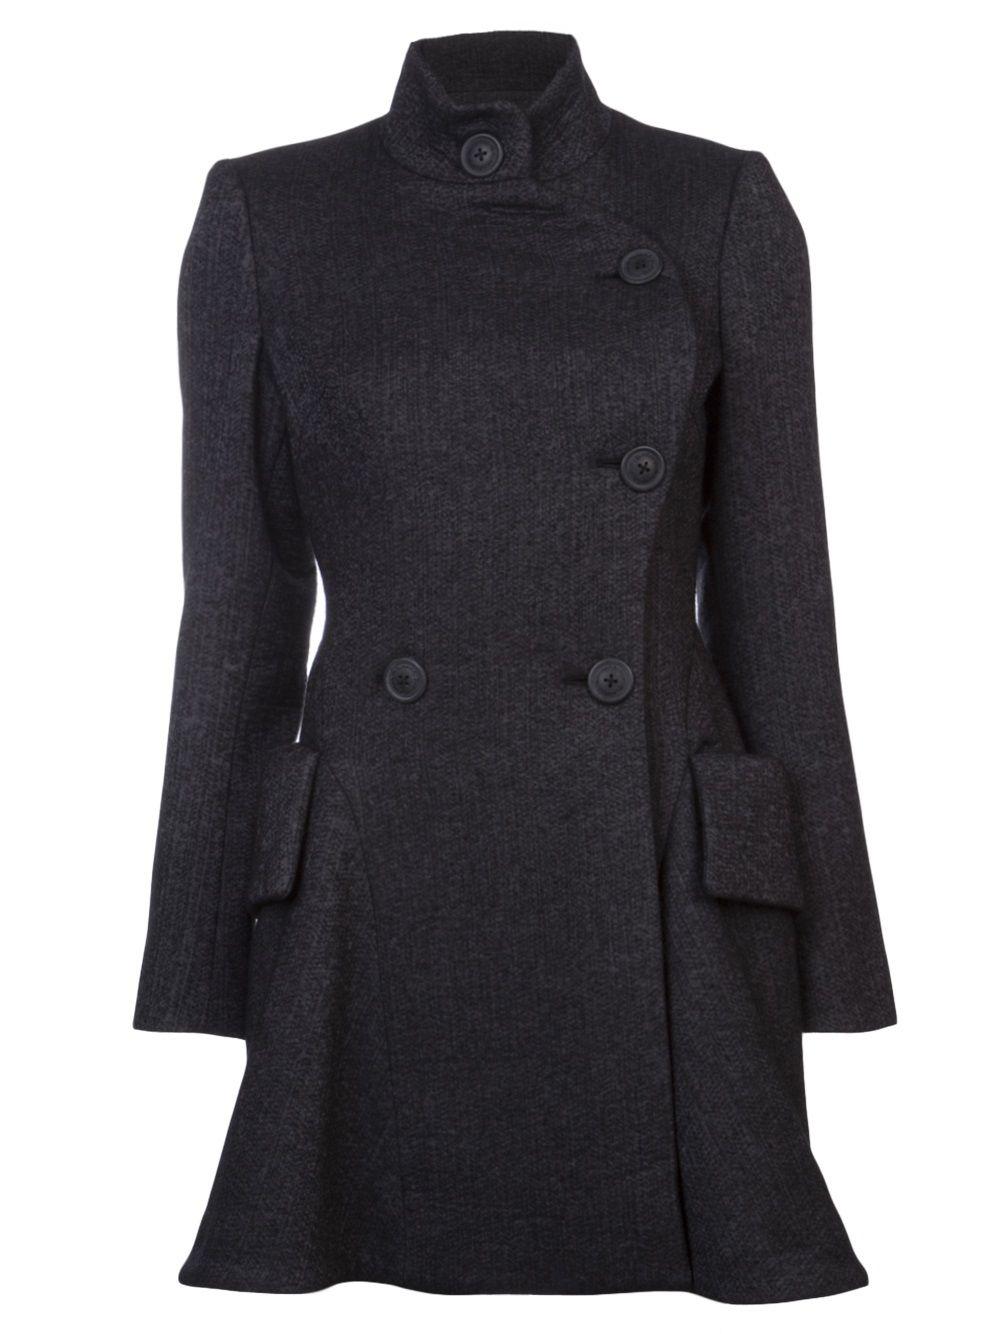 VIVIENNE WESTWOOD ANGLOMANIA 'Profile' coat